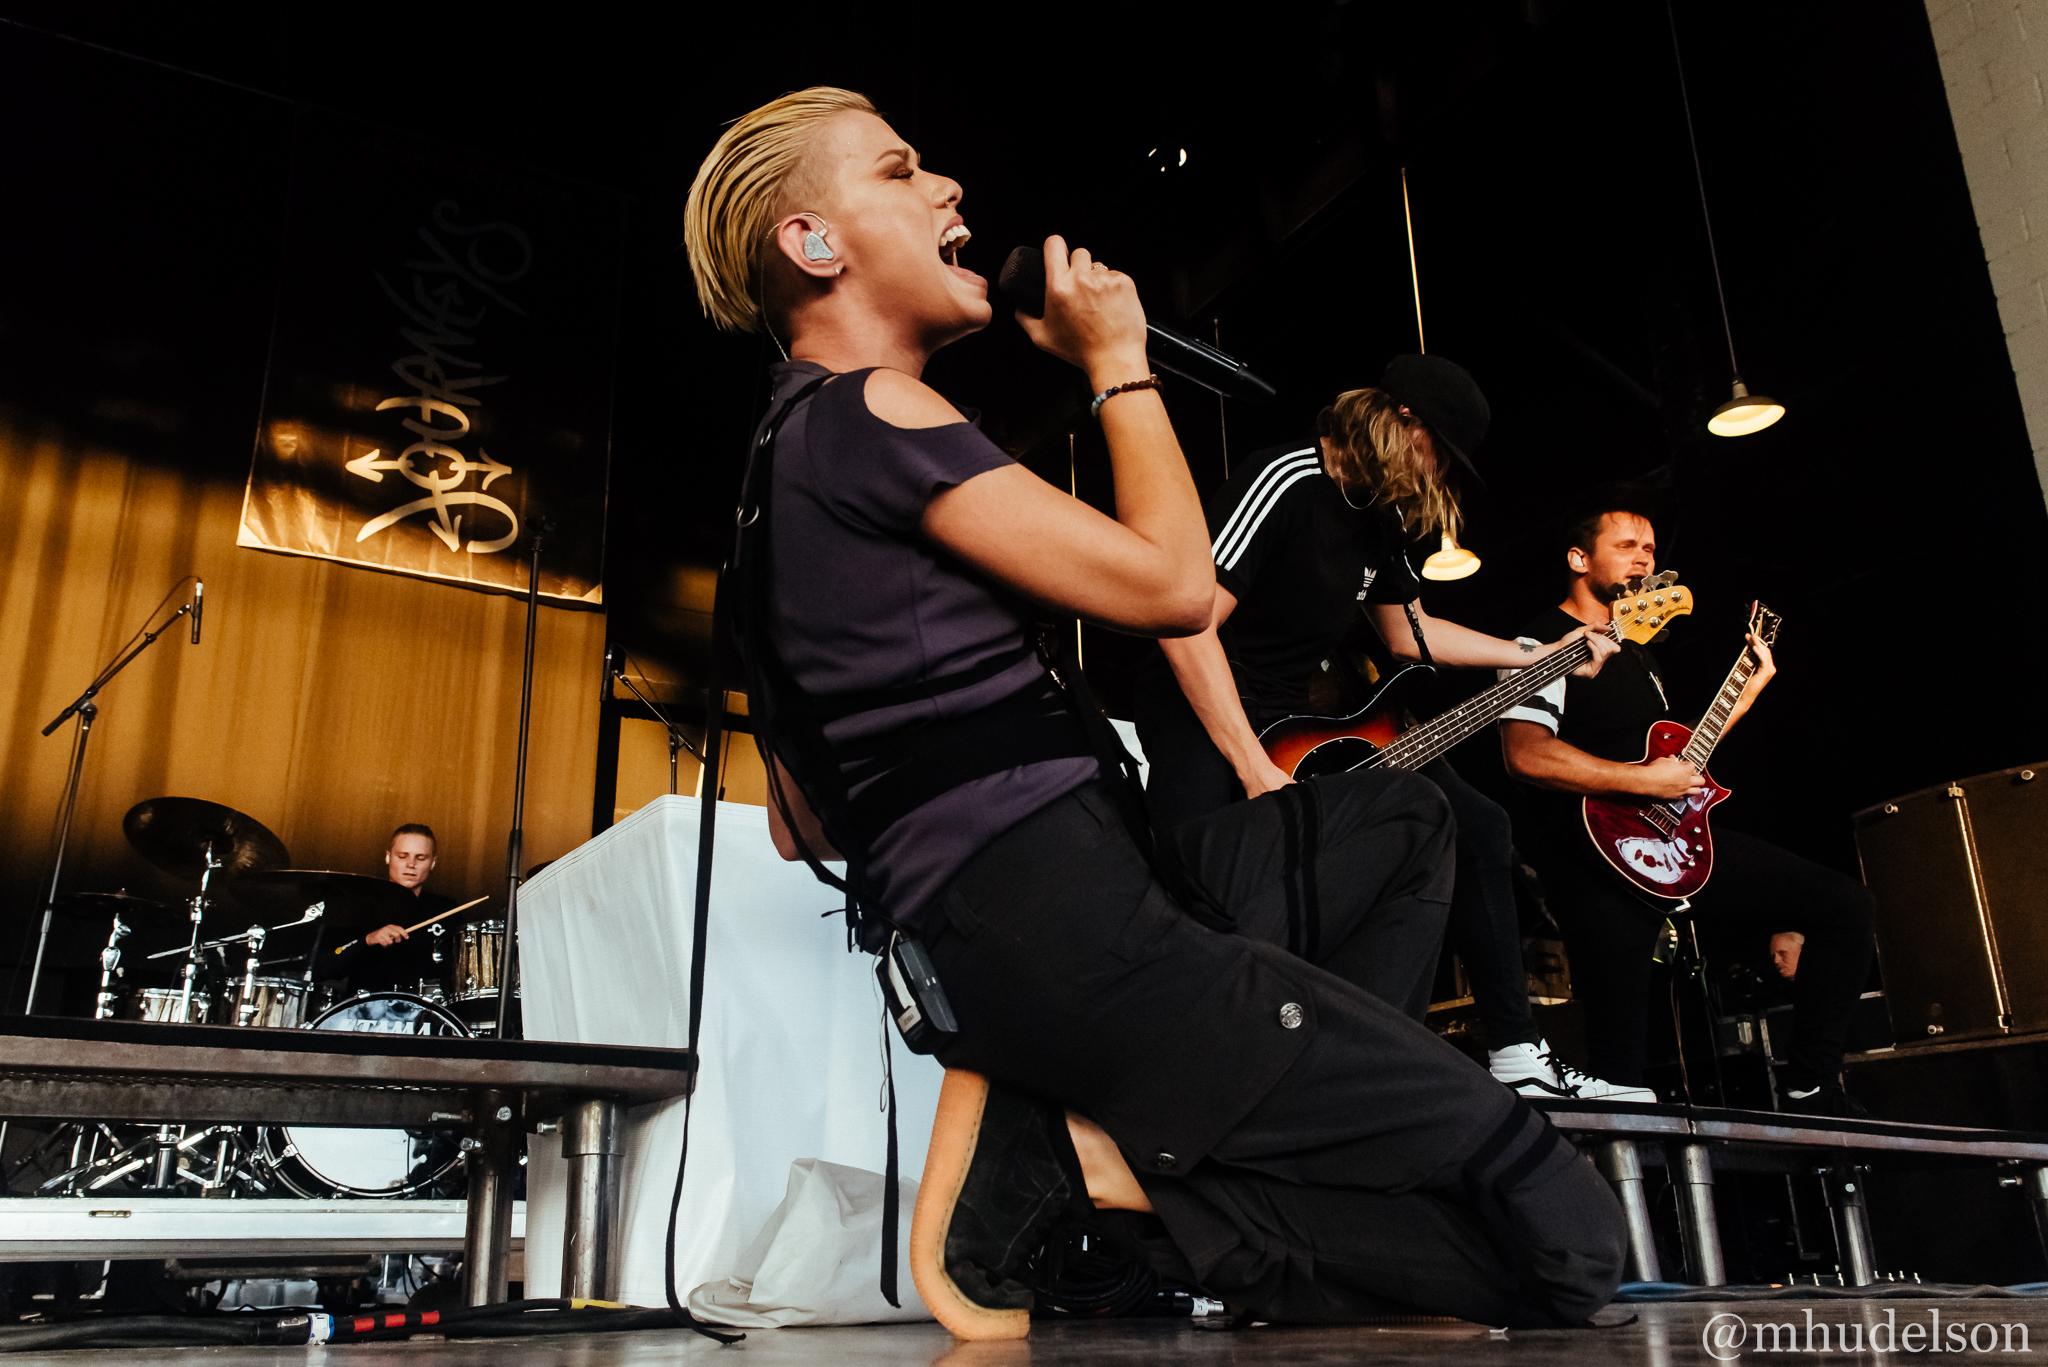 Tonight Alive / 7/5/16 / Vans Warped Tour / Charlotte, NC